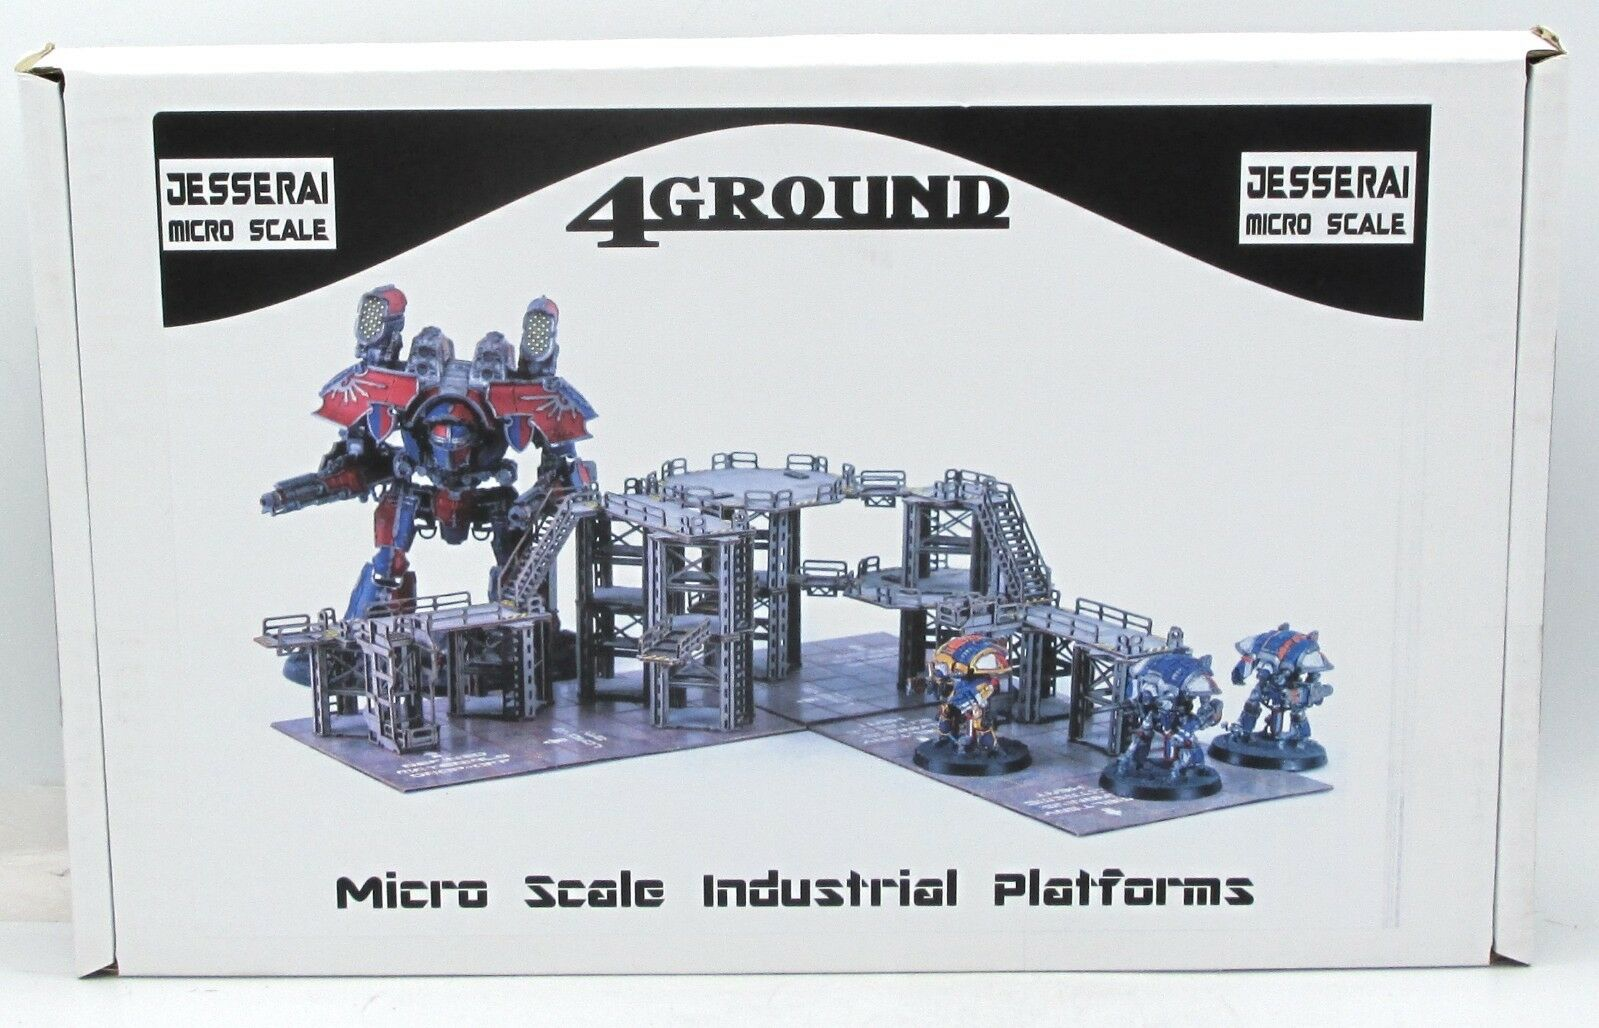 4ground mss_jes-105 industrielle plattformen (mikro - skala) terrain kulisse [6-8mm]